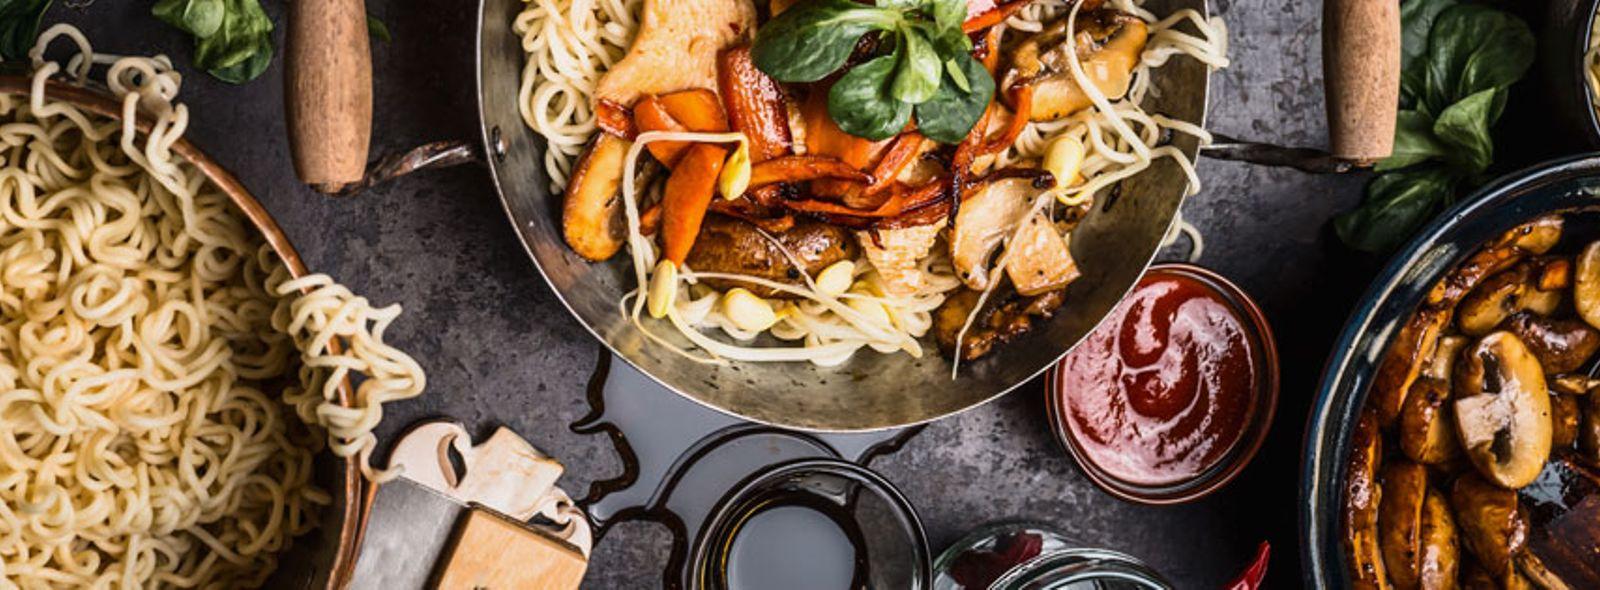 Cucina asiatica gourmet a Milano